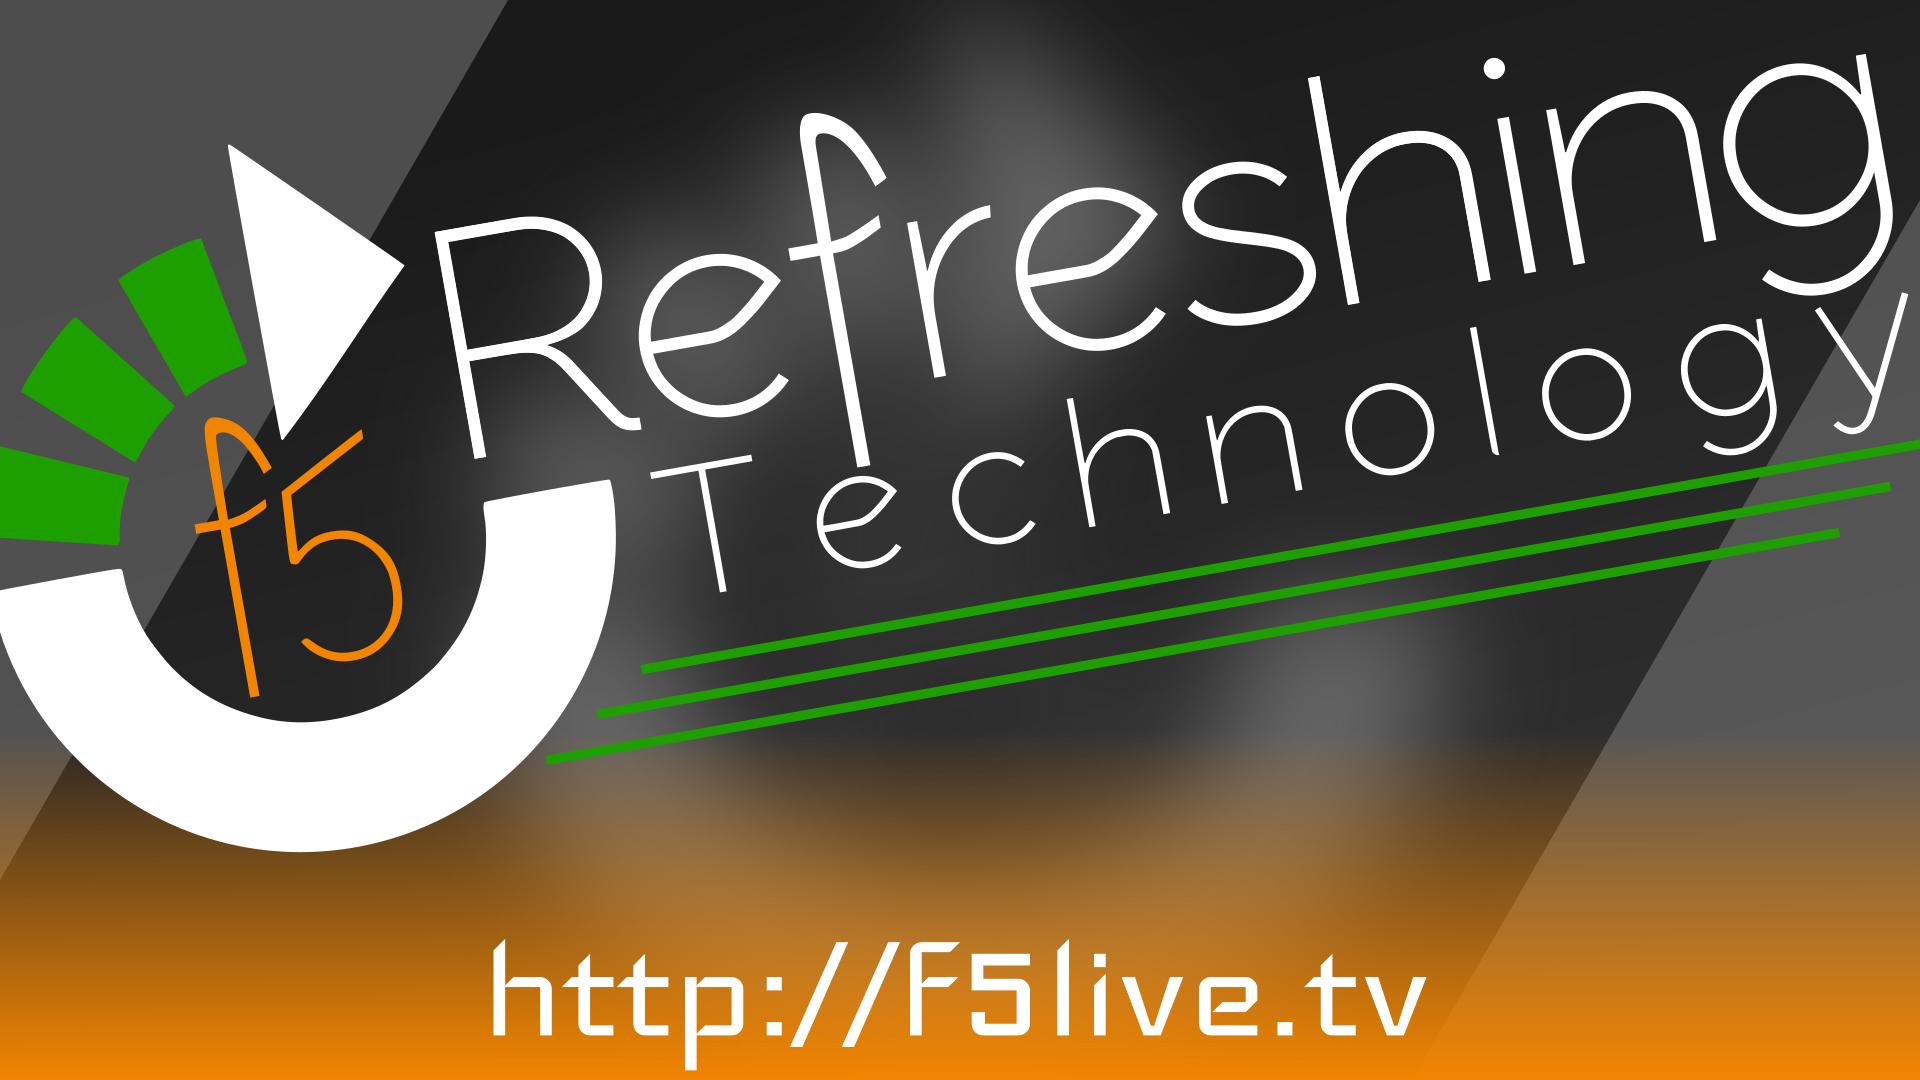 F5 Live: Refreshing Technology (Audio)